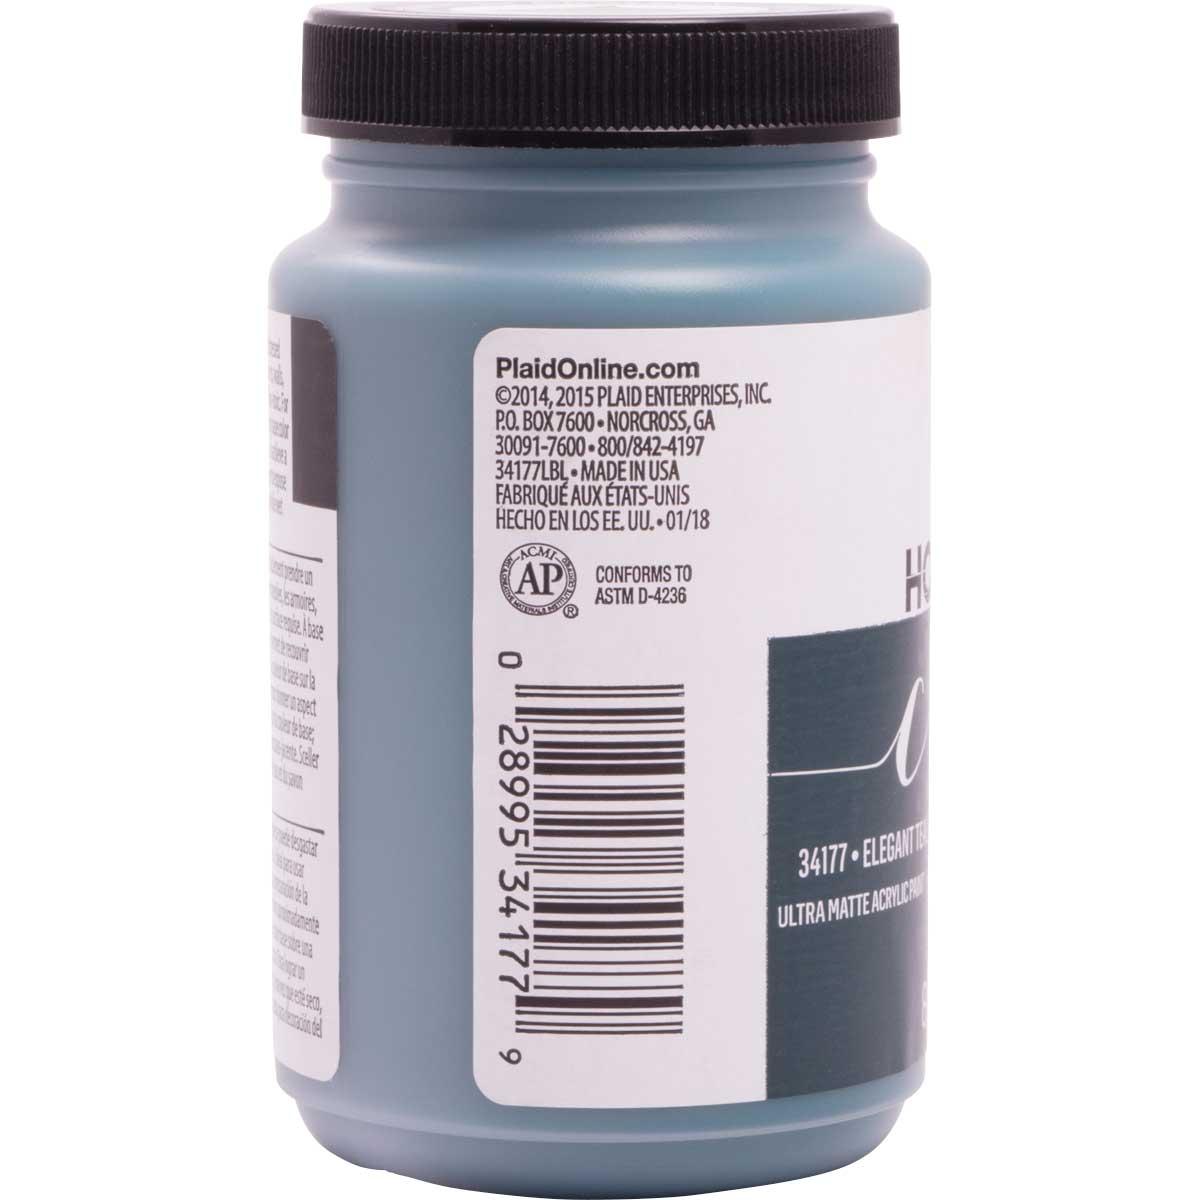 FolkArt ® Home Decor™  Chalk - Elegant Teal, 8 oz.